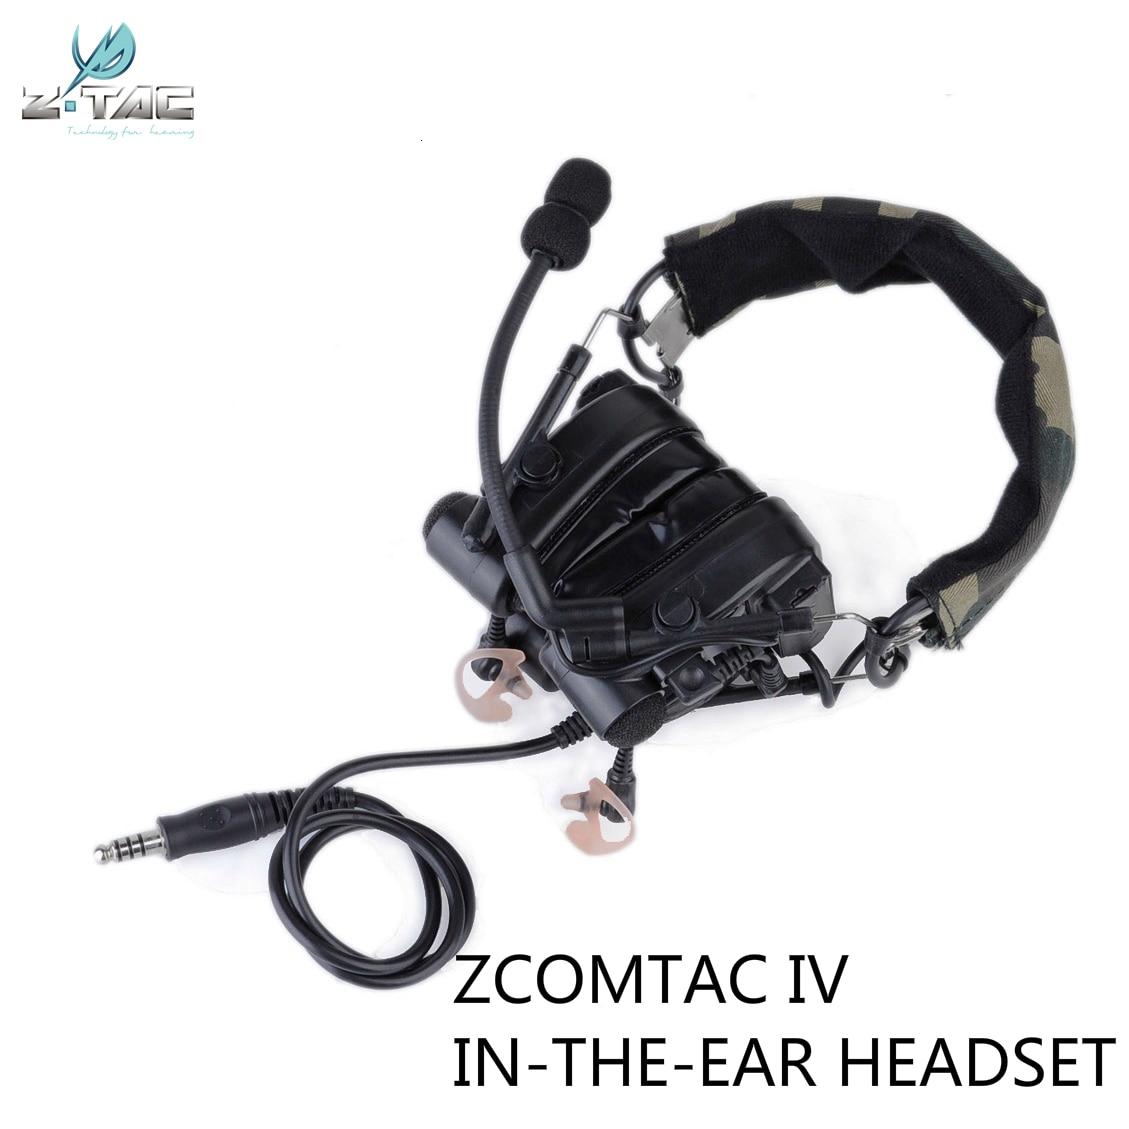 z tac combate tatico tactical zcomtac iv headset z038 cancelar o ruido fones de ouvido fone